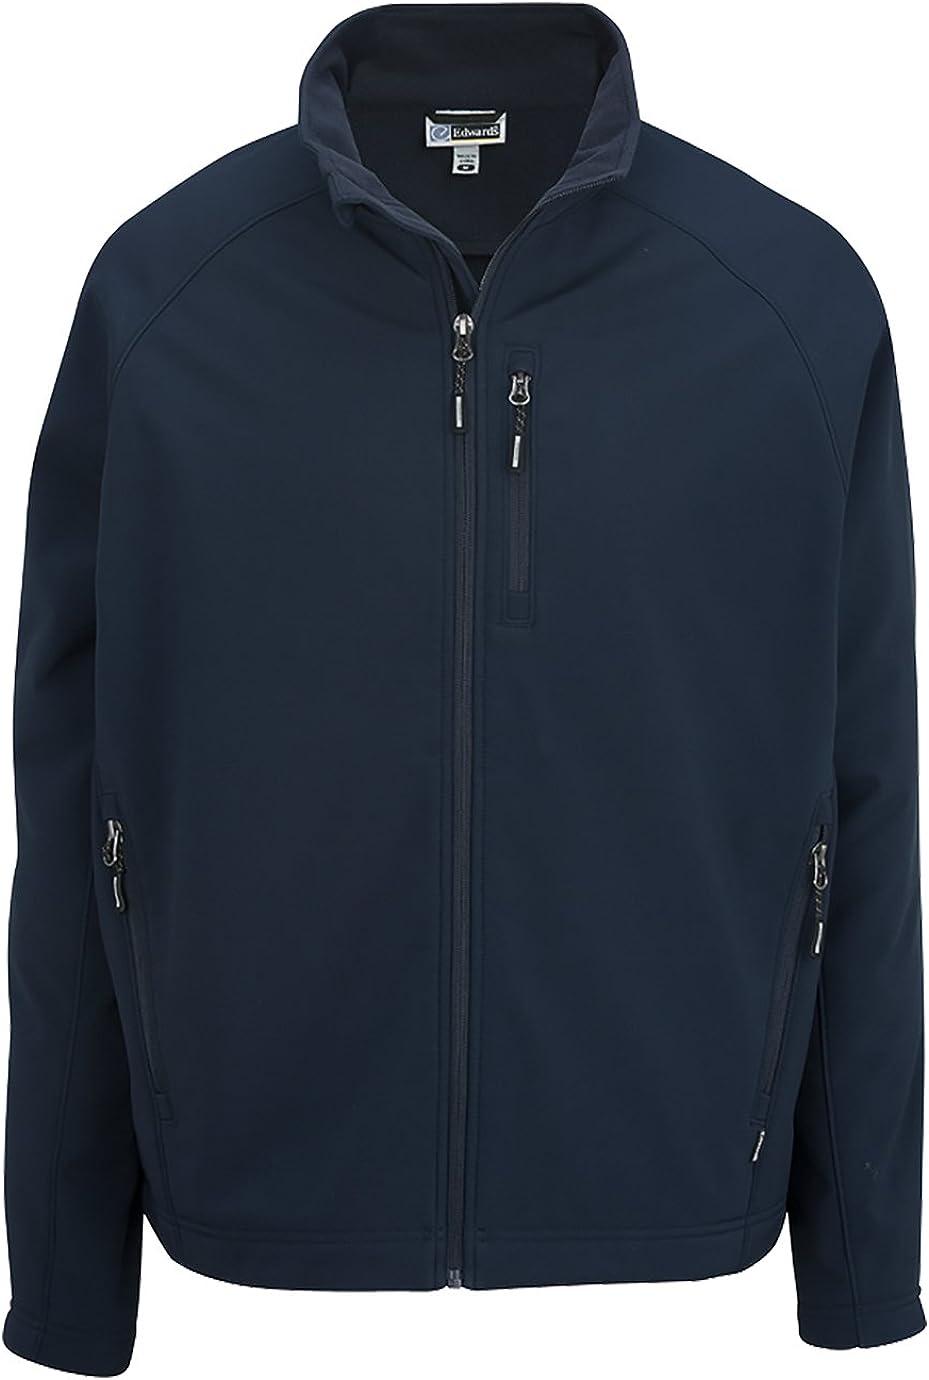 Edwards Garment ED Garments Men's Soft Shell Jacket